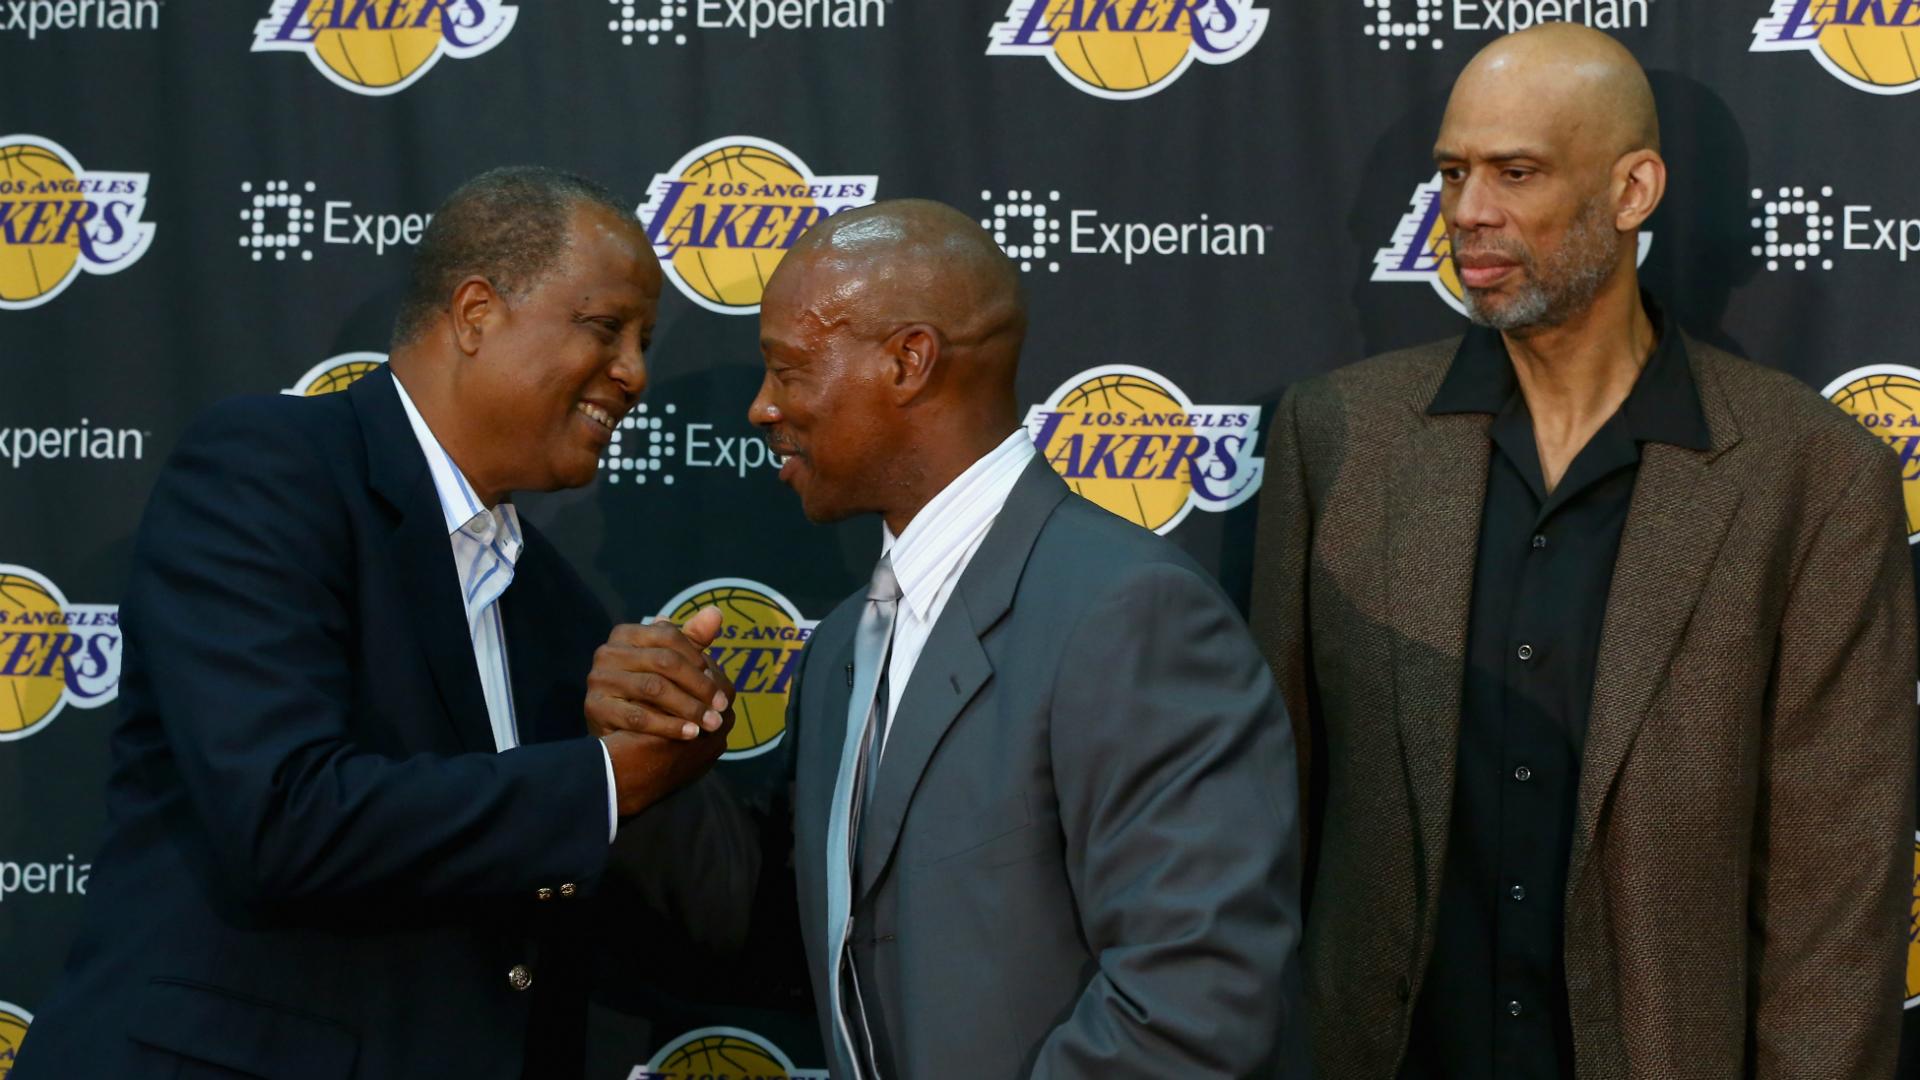 Lakers legend Jamaal Wilkes says Kobe Bryant needs new smaller